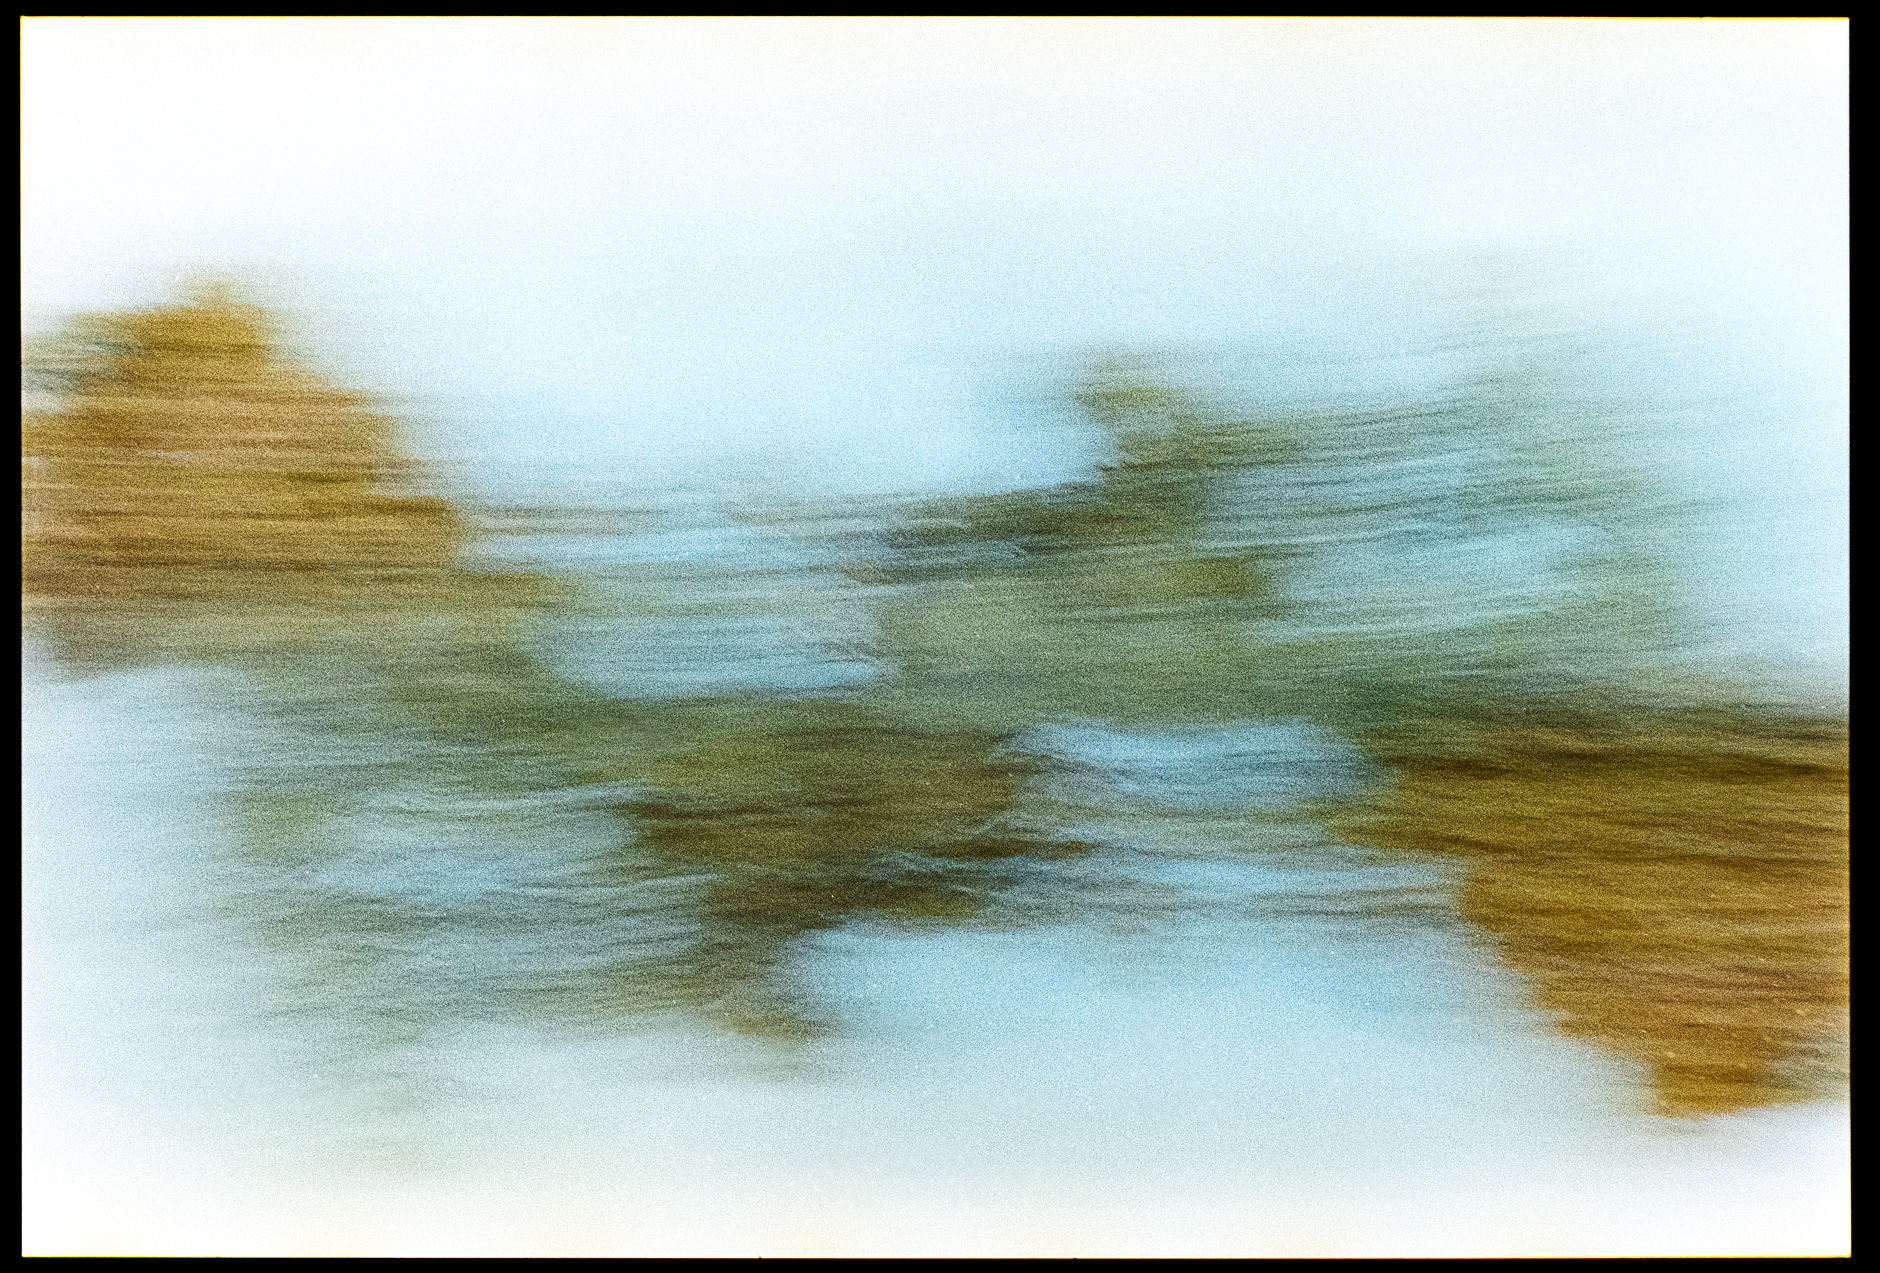 Klecksography, inkblots inspired photography